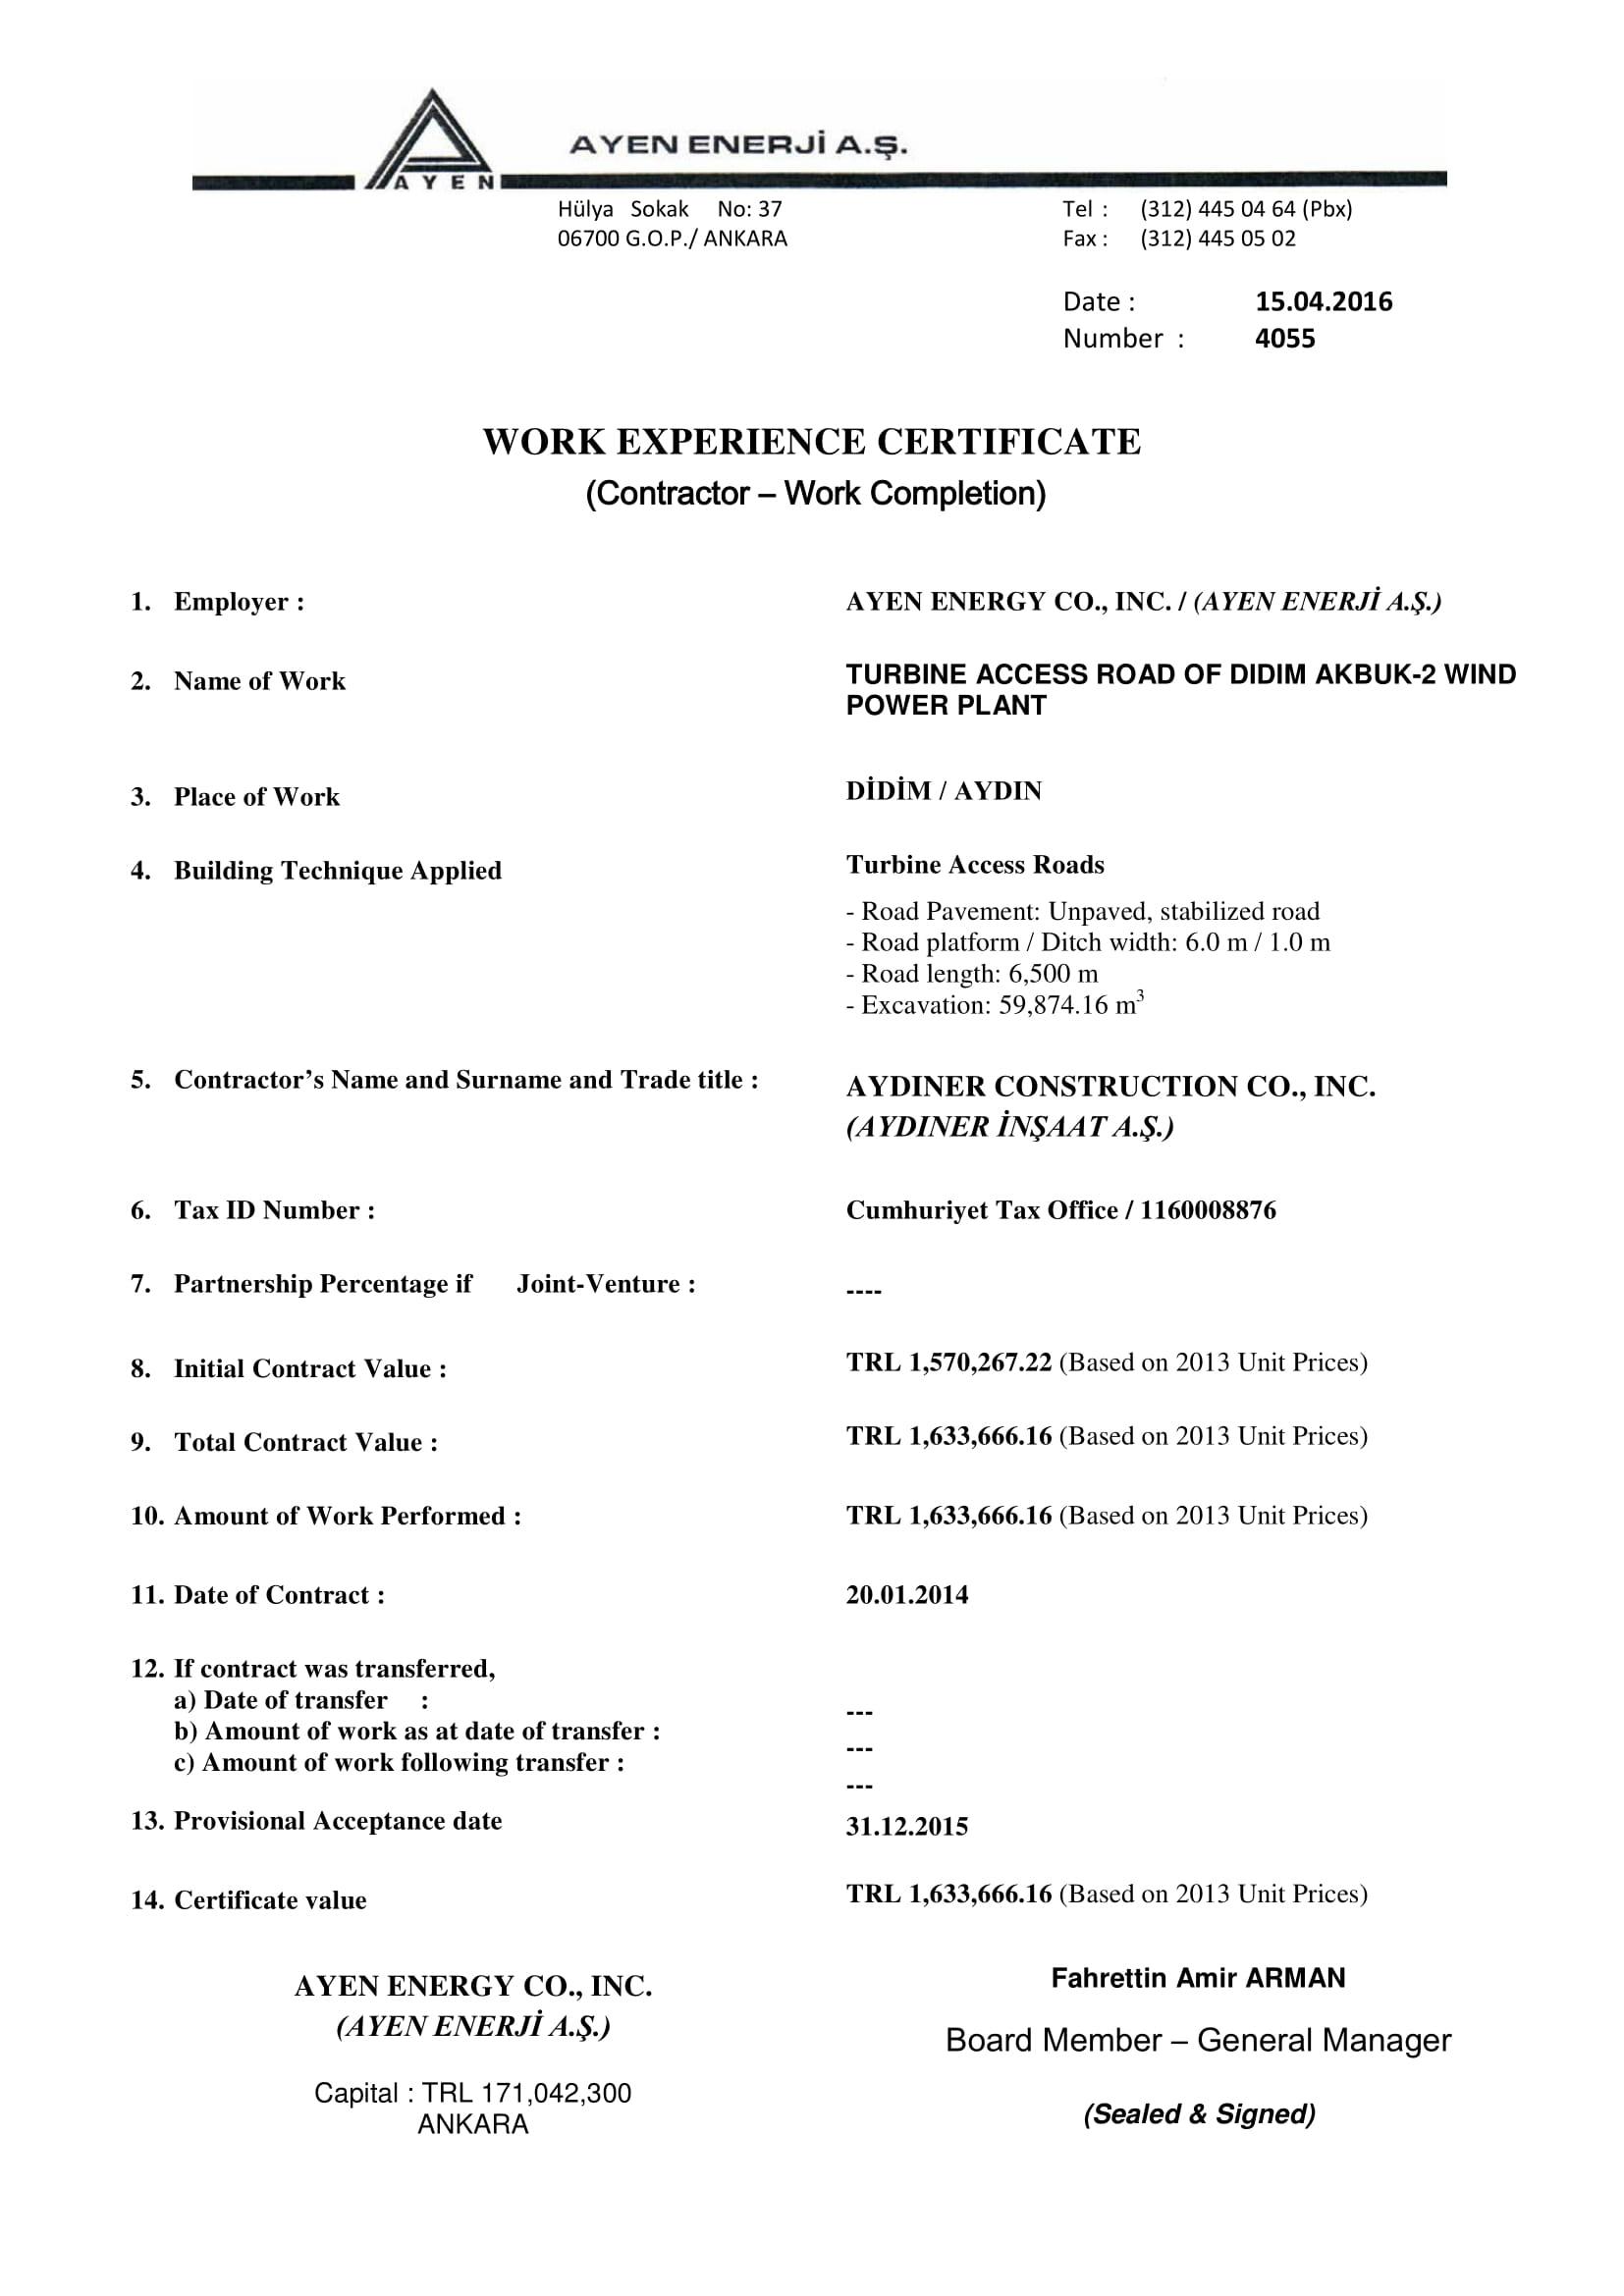 work experience certificate 1